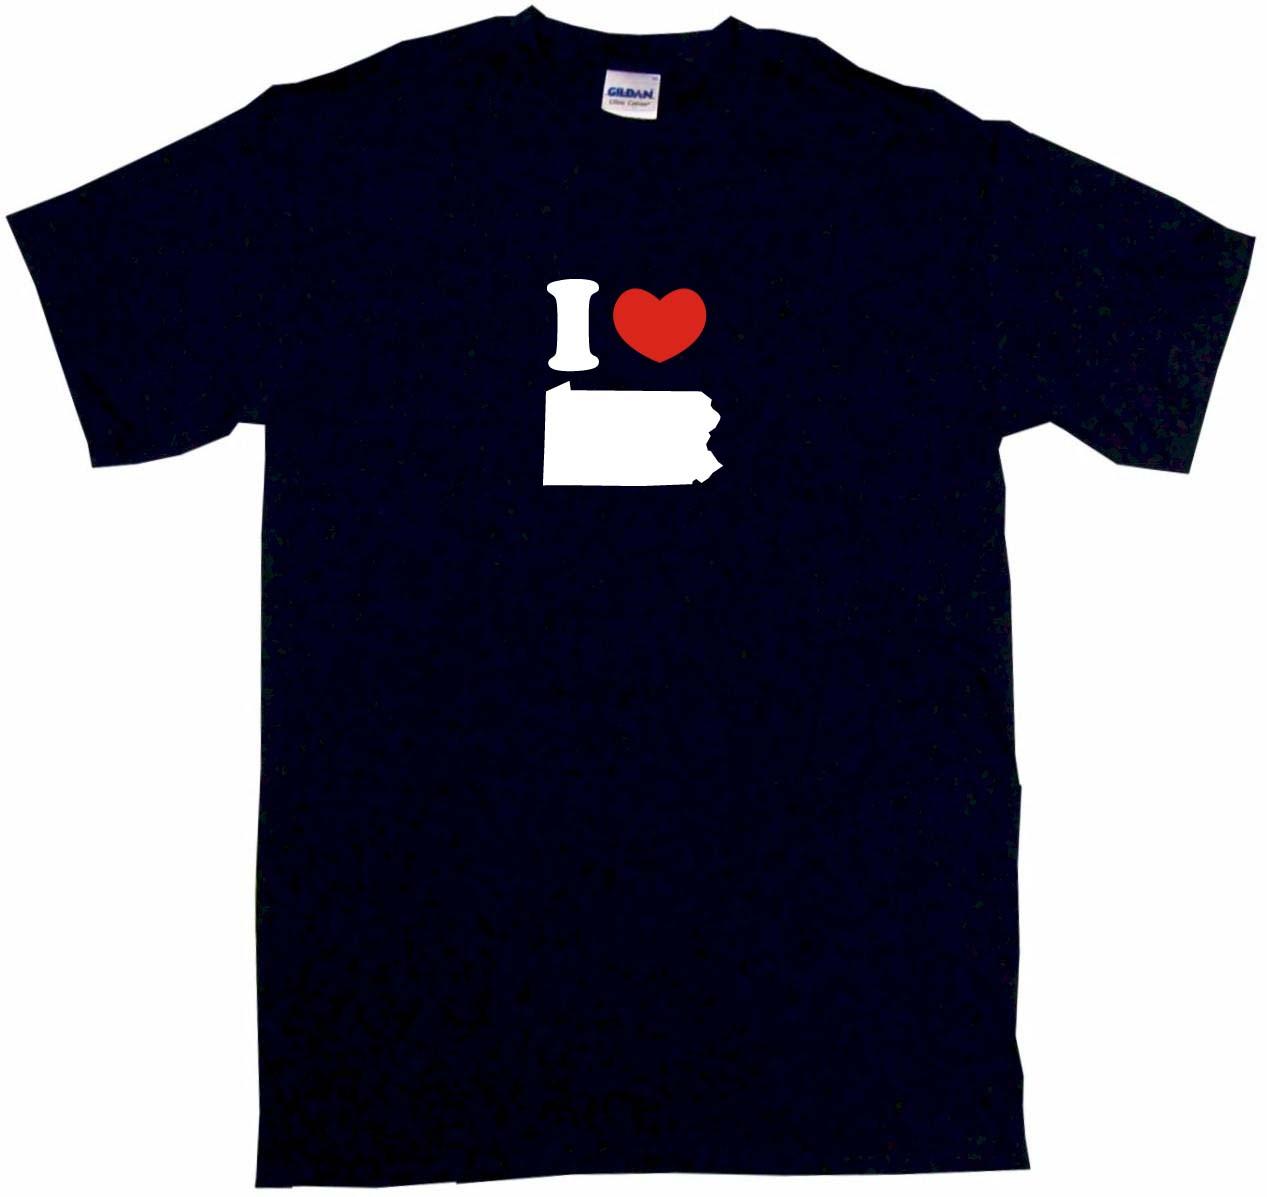 1267x1197 I Heart Love Pennsylvania Silhouette Mens Tee Shirt Pick Ebay